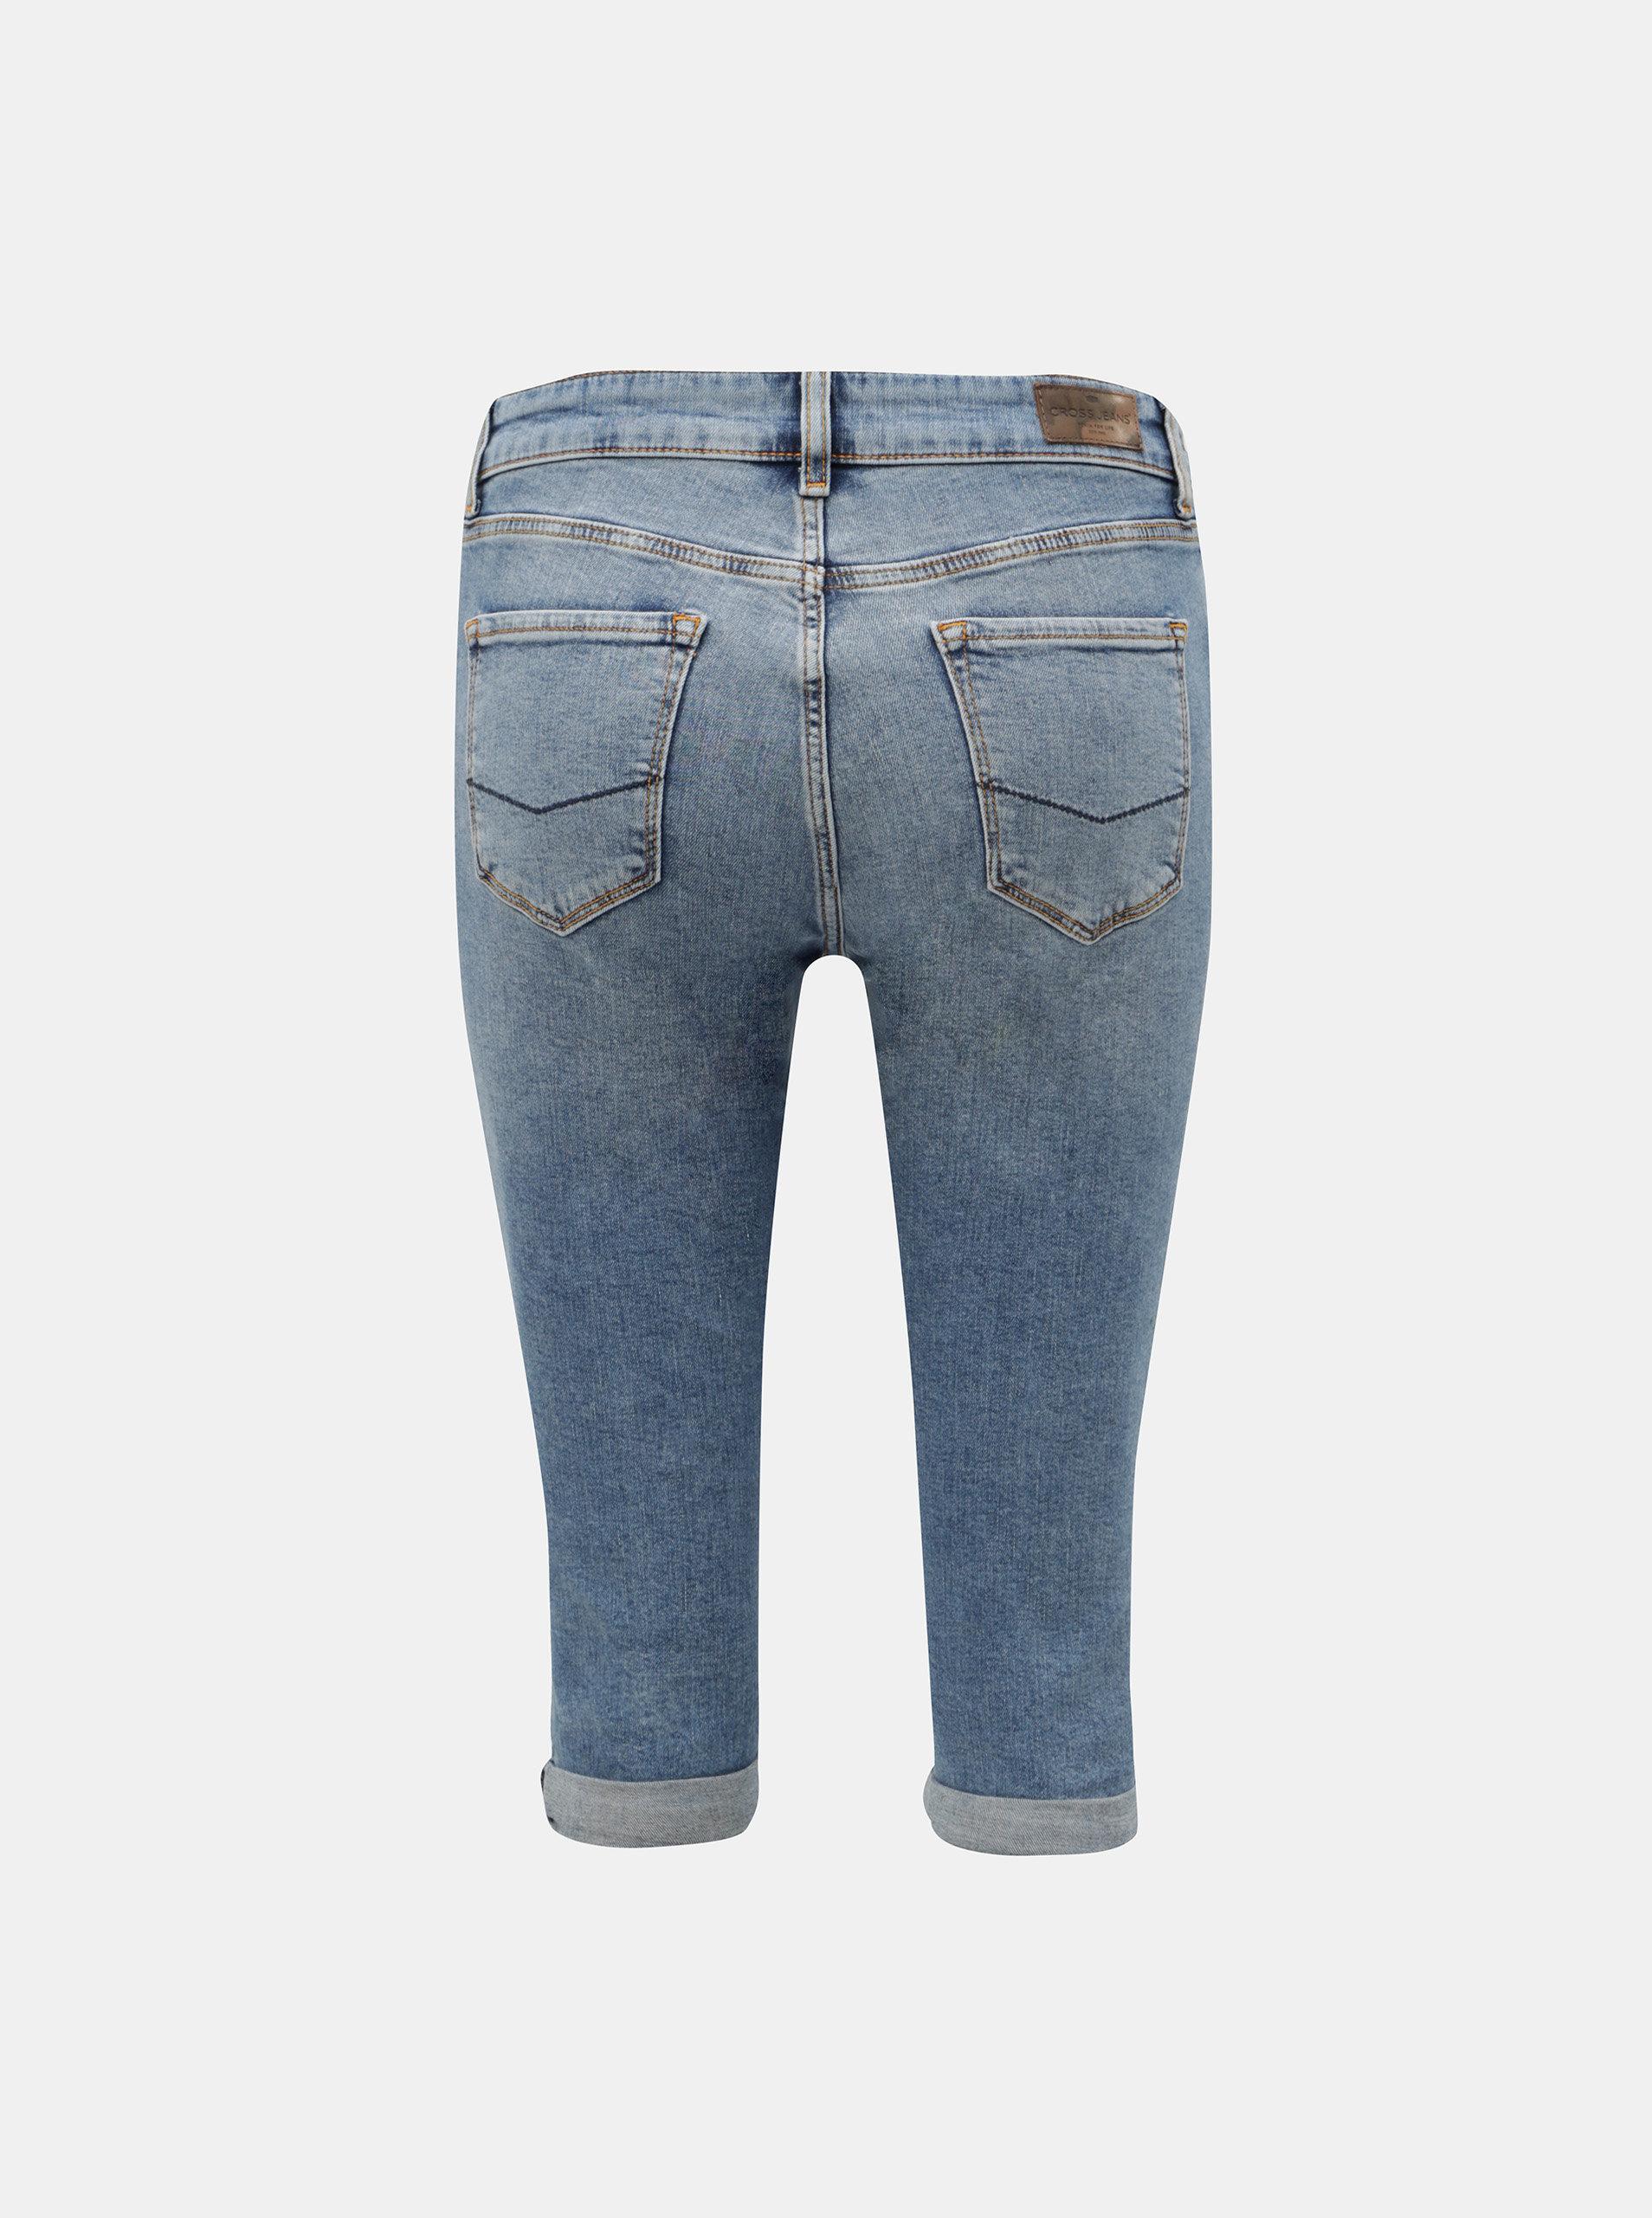 77a281f2e7 Modré dámske rifľové kraťasy Cross Jeans Adele ...